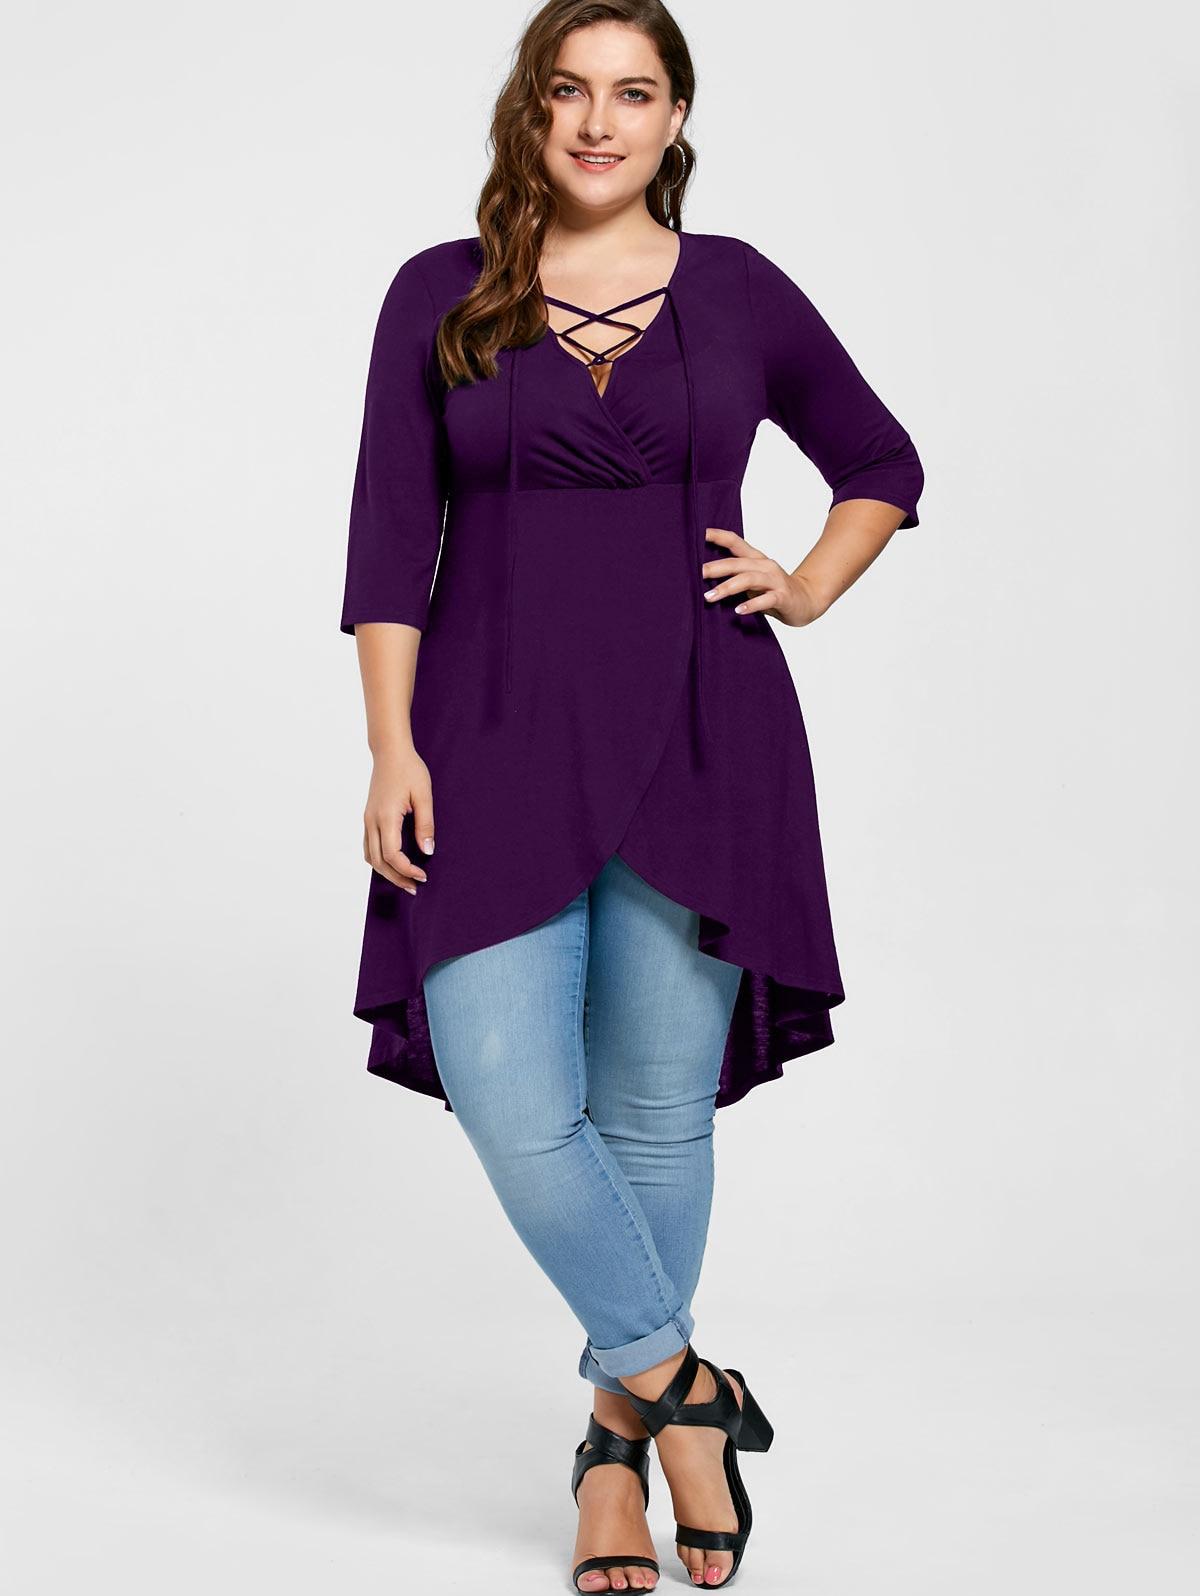 234d421396c97 Shirt Length  Long Sleeve Length  Three Quarter Collar  V-Neck Style  Casual  Season  Fall